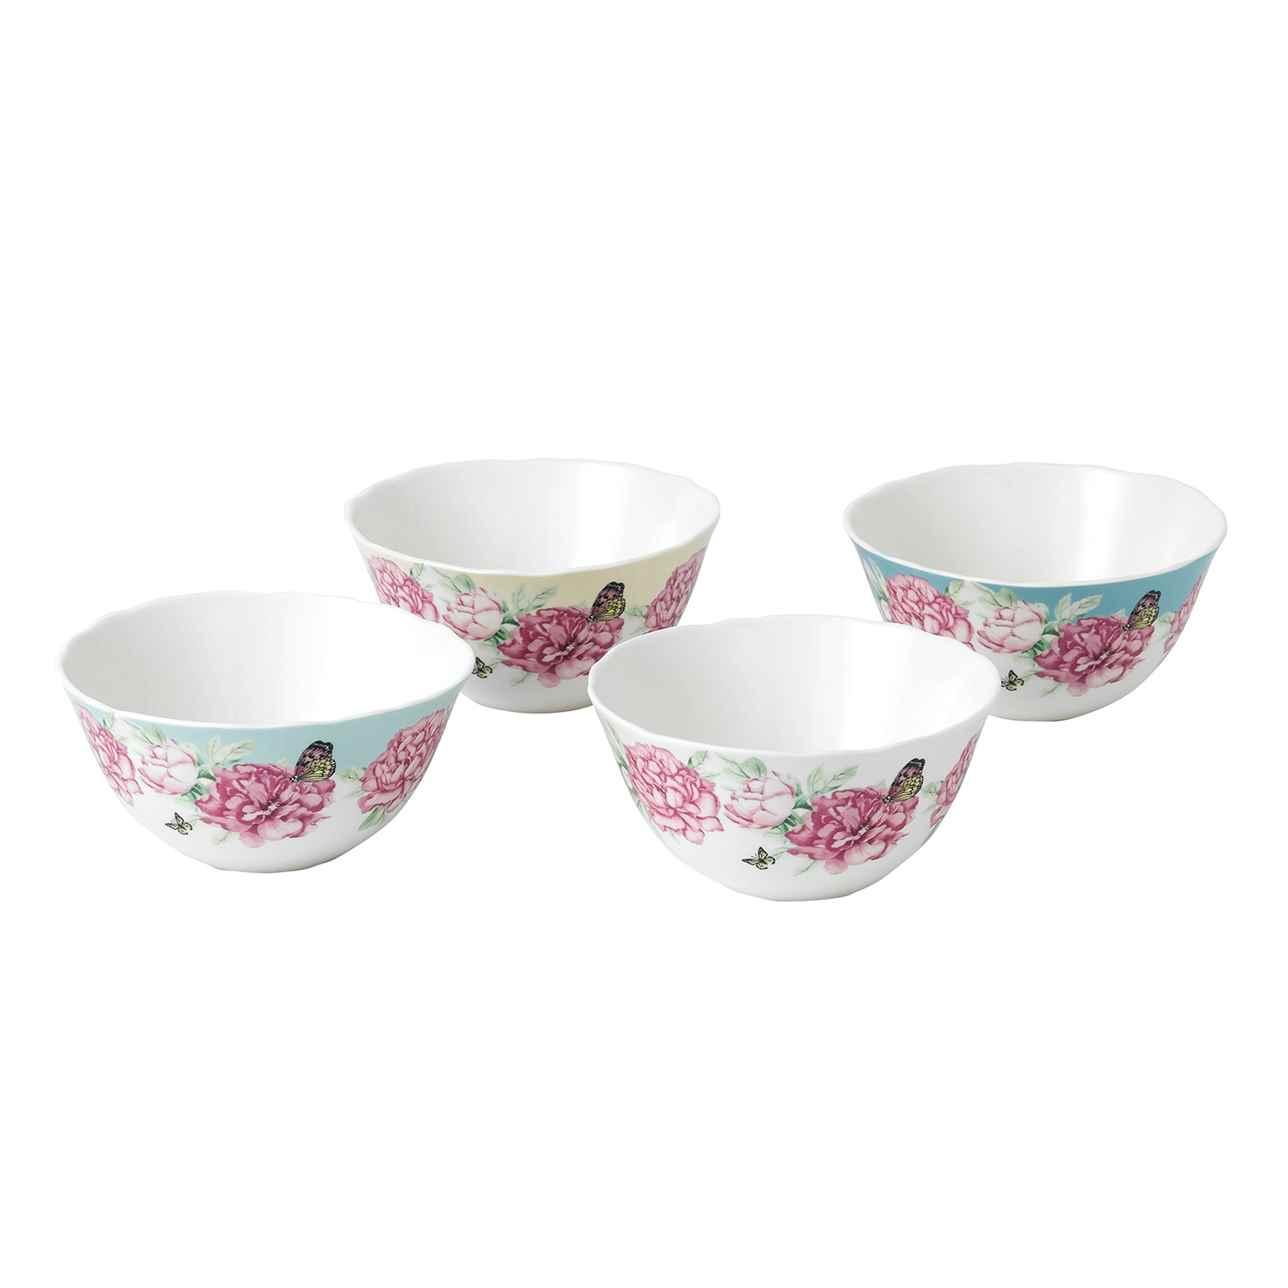 Royal Albert Miranda Kerr Everyday Friendship Cereal Bowls, Set of 4